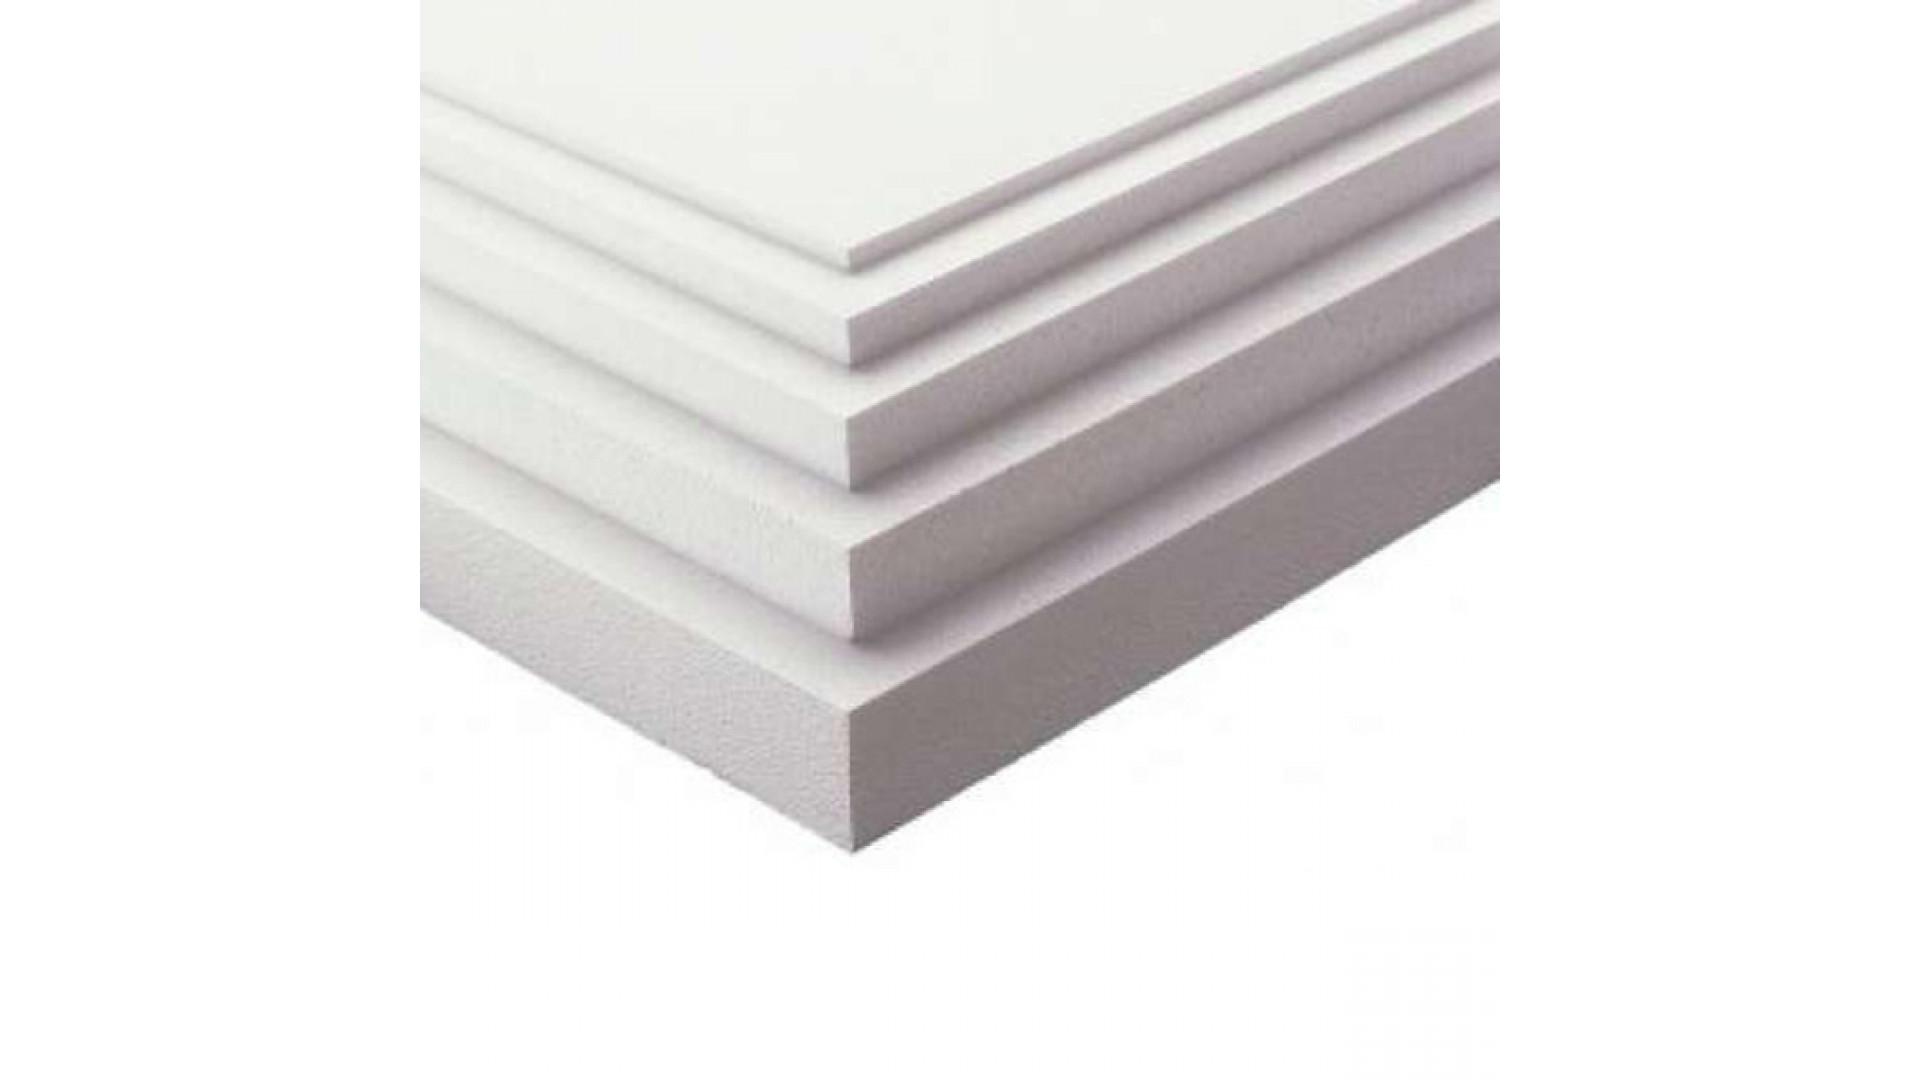 17499_polystyren-1920x1080